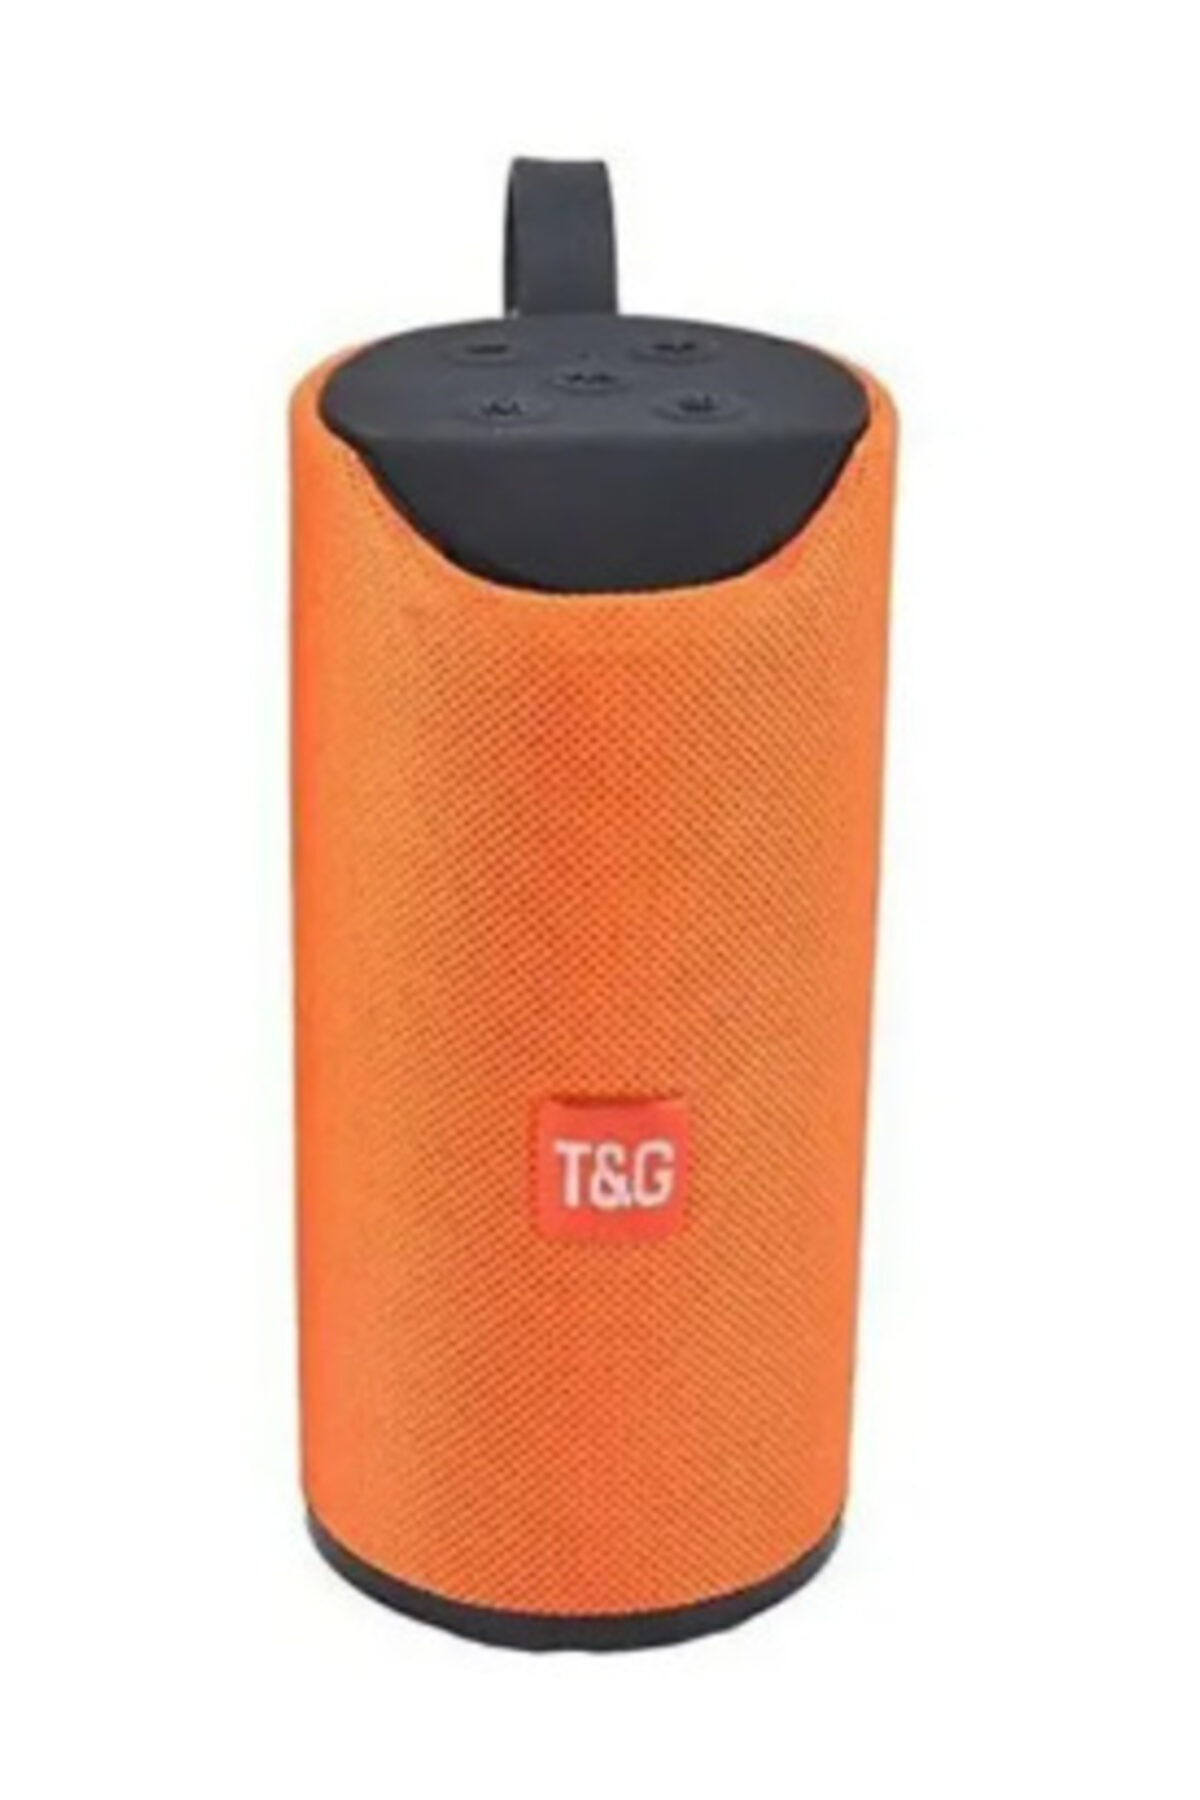 TG 113 Bluetooth Speaker Ses Bombası Hoparlör Yüksek Ses Kalitesi